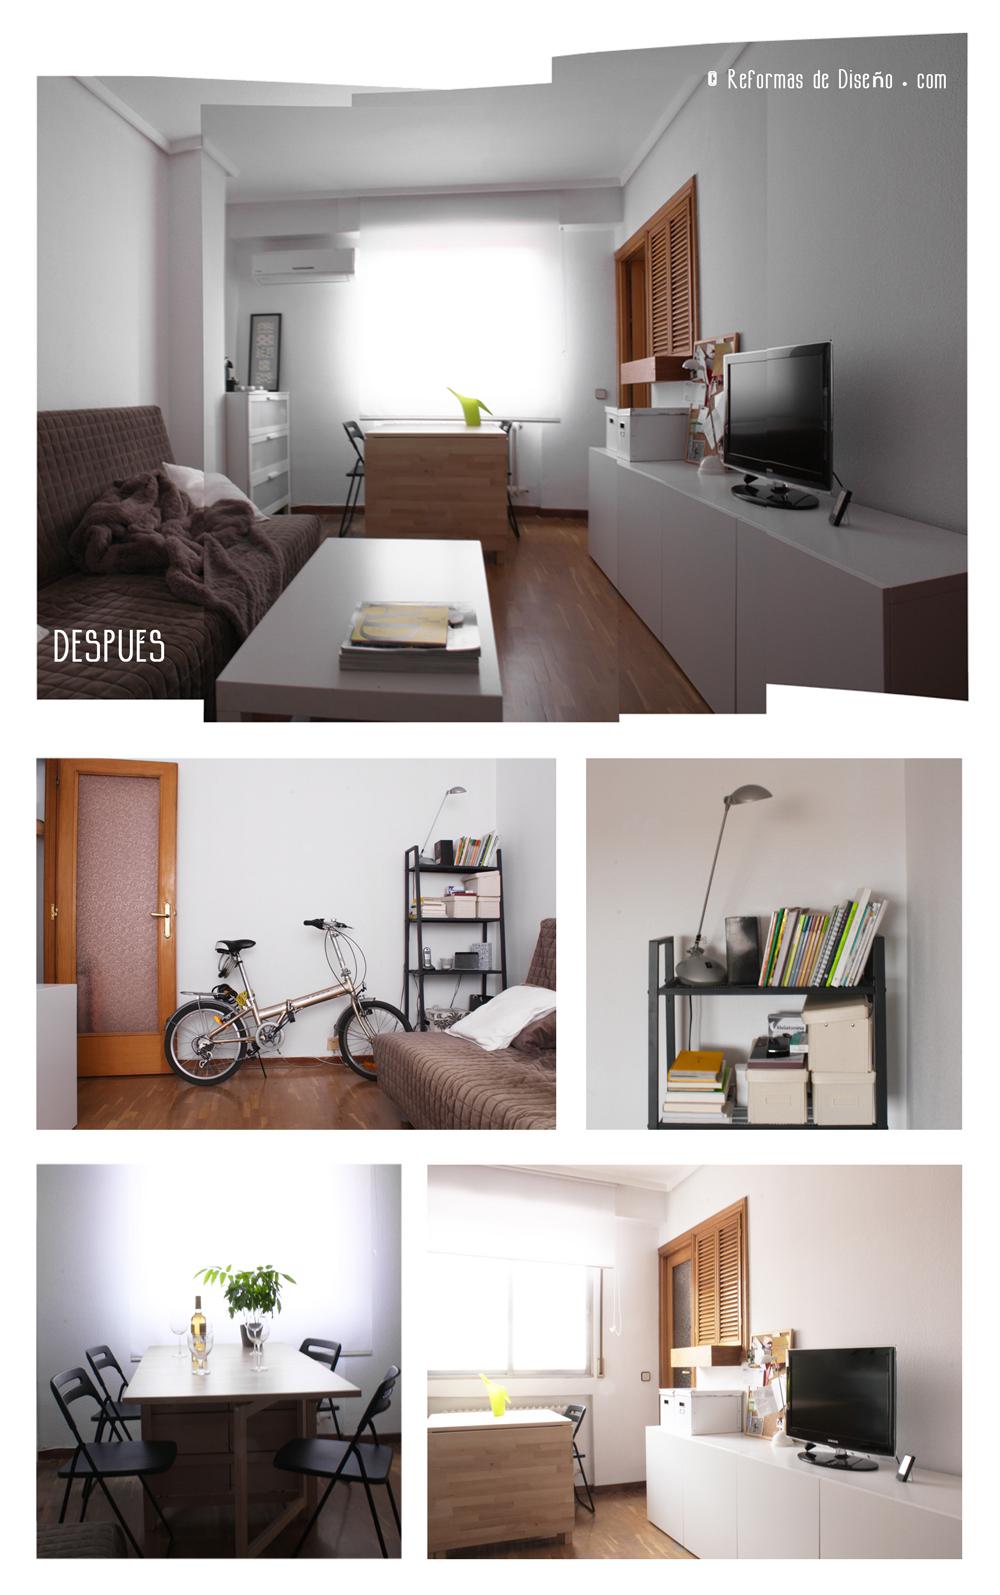 HOME STAGING MADRID CHAMBERI despues BARATO ECONOMICO IKEA AMUEBLAMIENTO